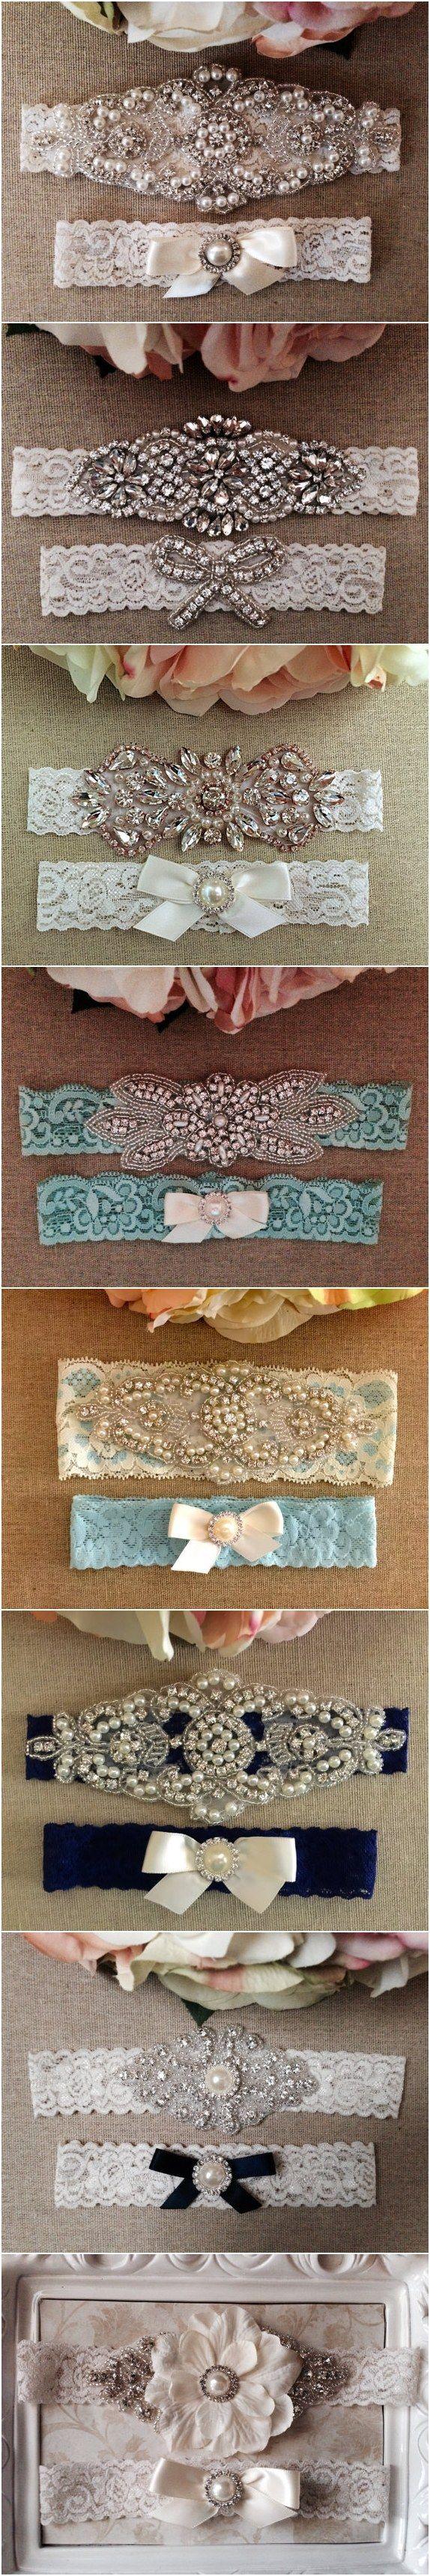 Vintage Lace Wedding Bridal Garter Sets via BellaFleurBridal / http://www.deerpearlflowers.com/wedding-garters-sets-from-etsy/4/